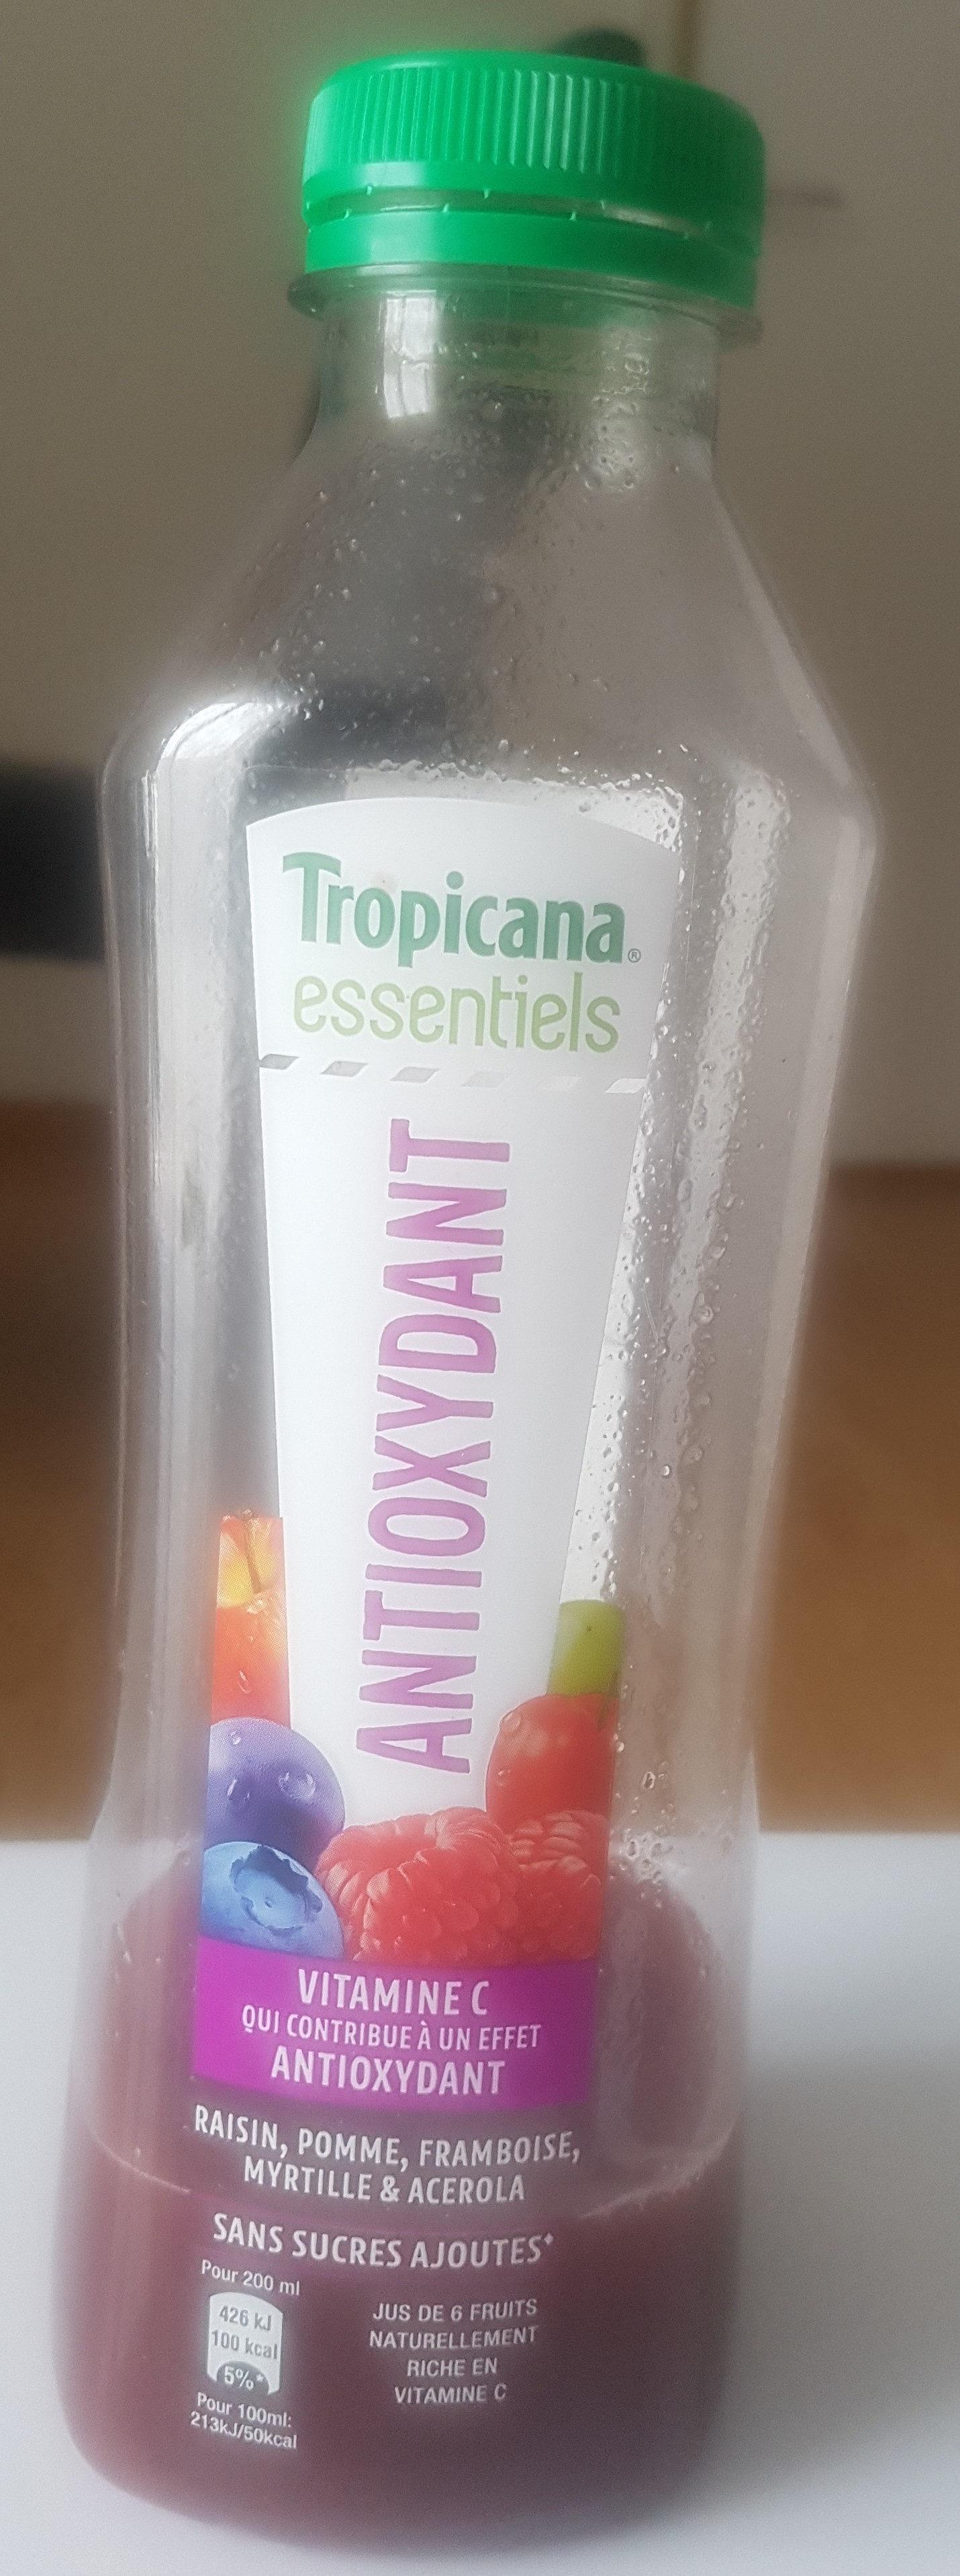 Tropicana essentiels antioxydant - Product - fr